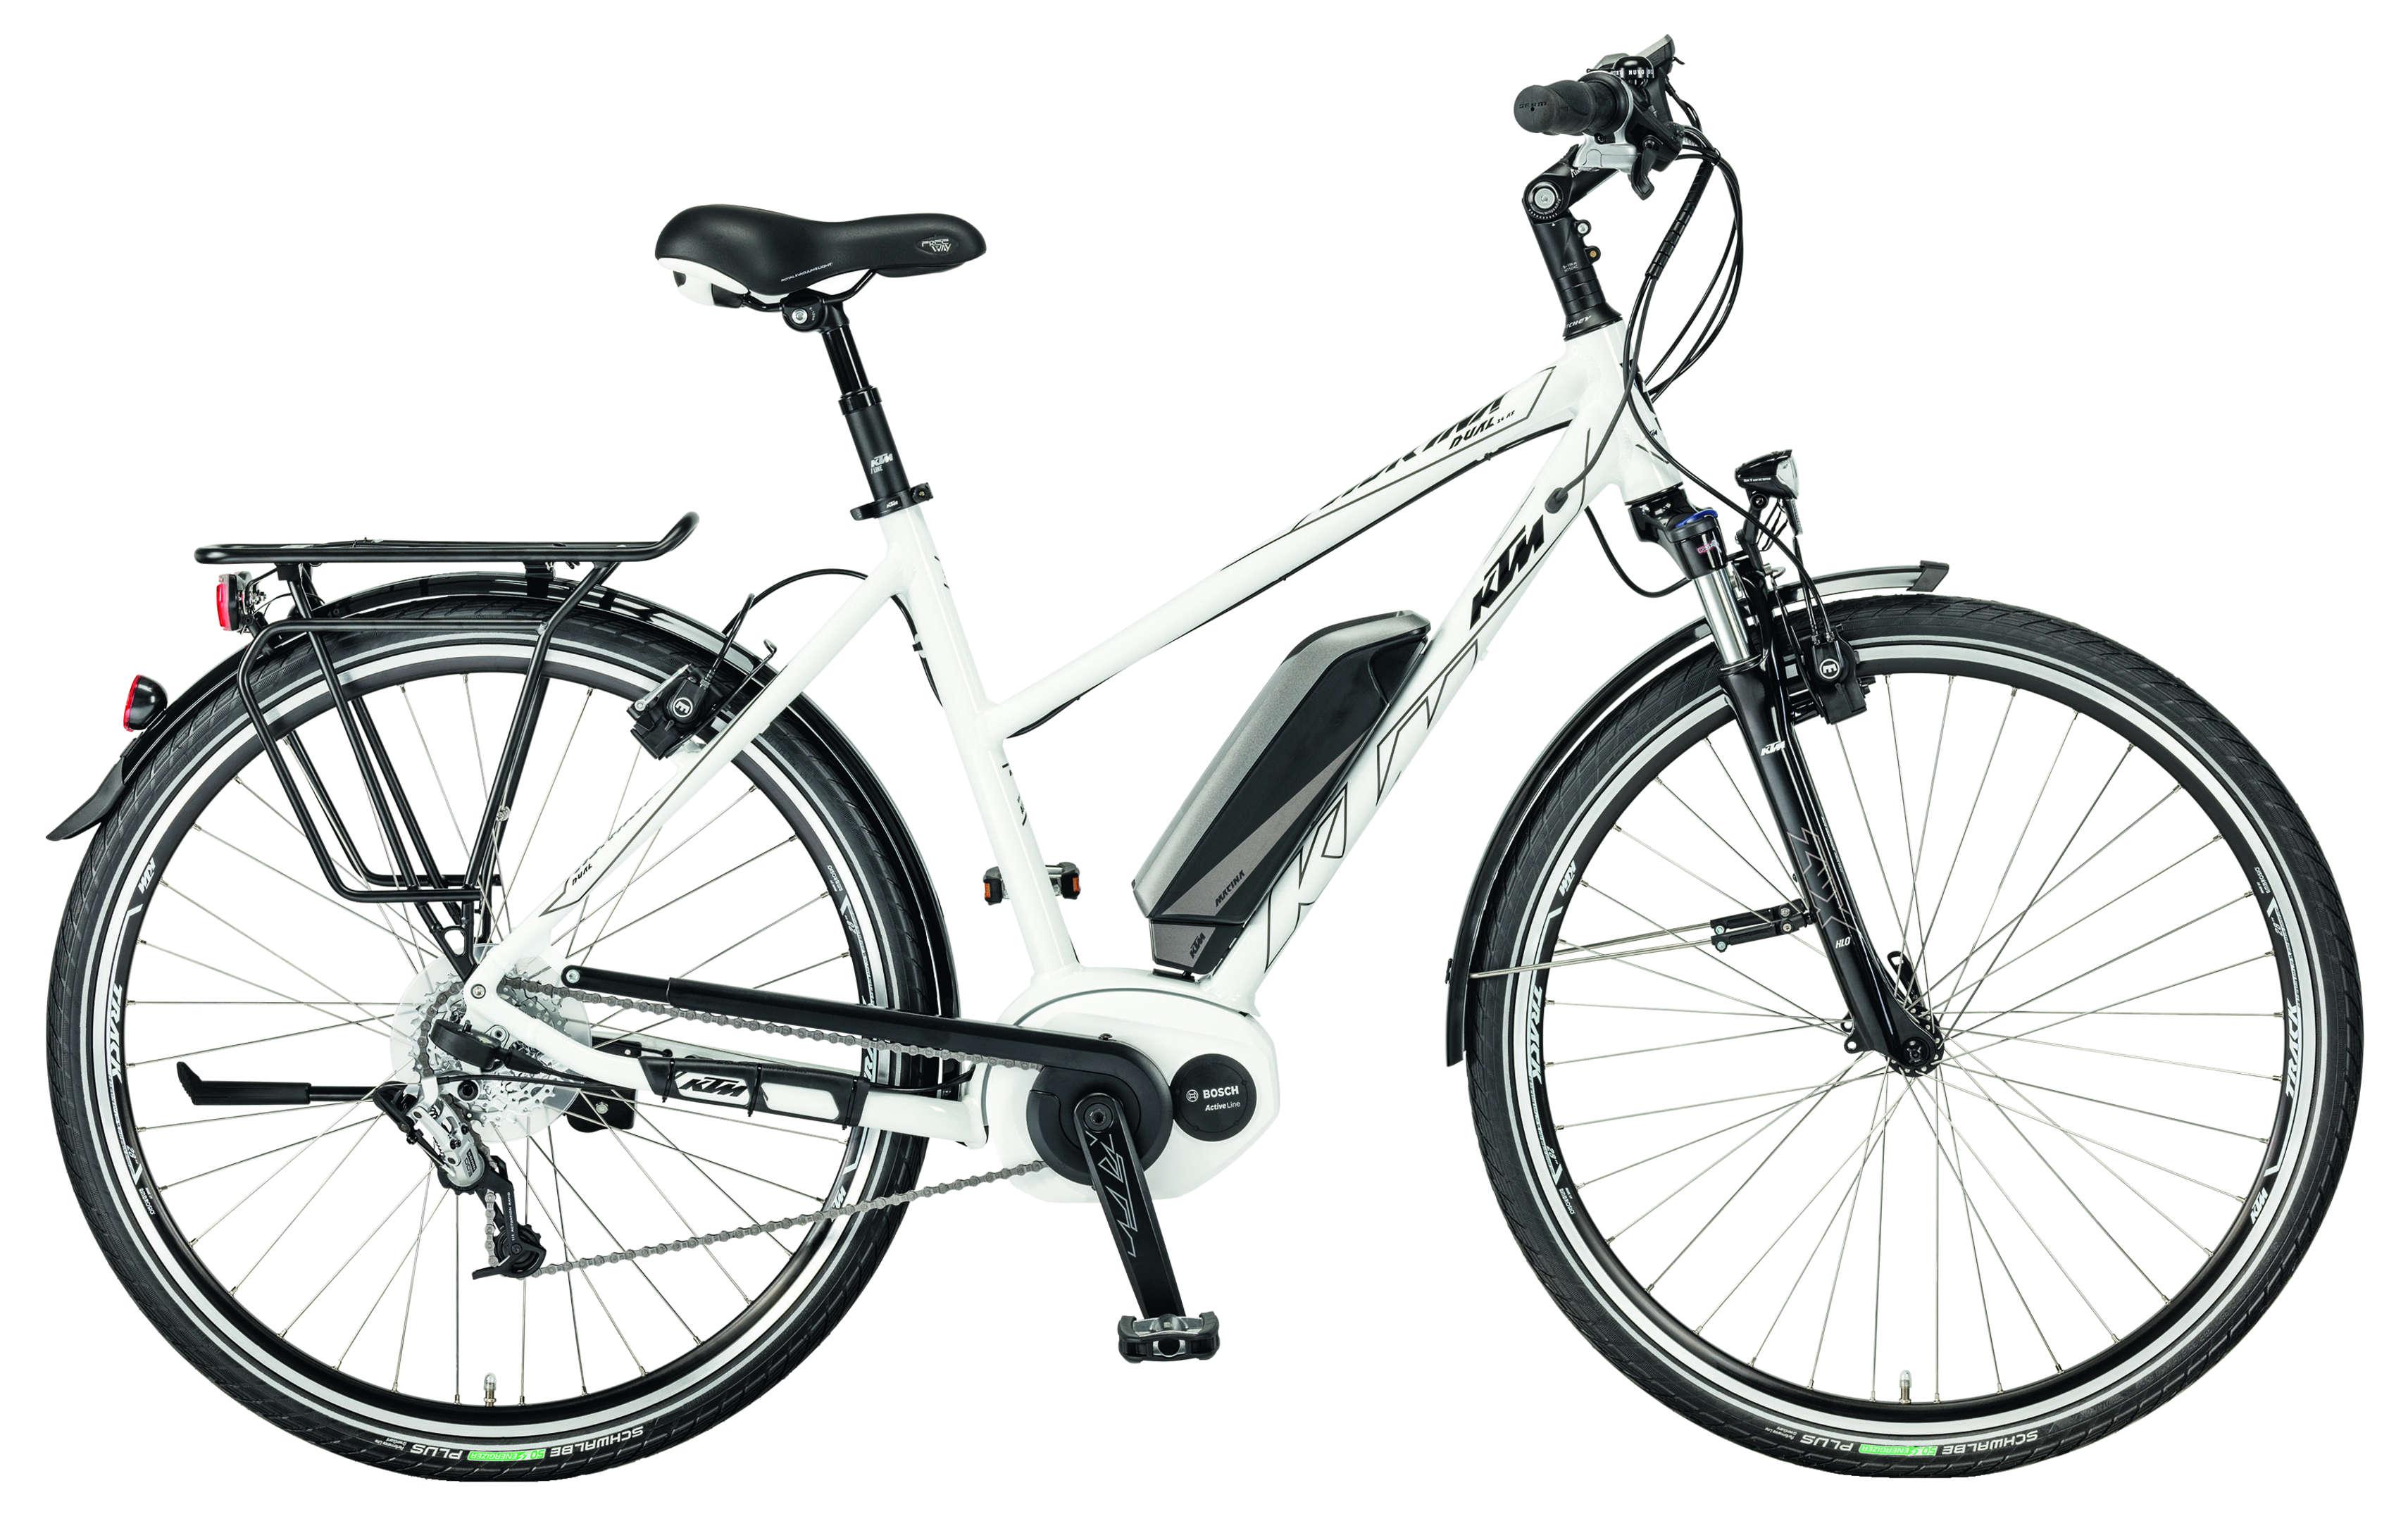 ktm e bike macina dual 24 a5 eurorad bikeleasingeurorad. Black Bedroom Furniture Sets. Home Design Ideas